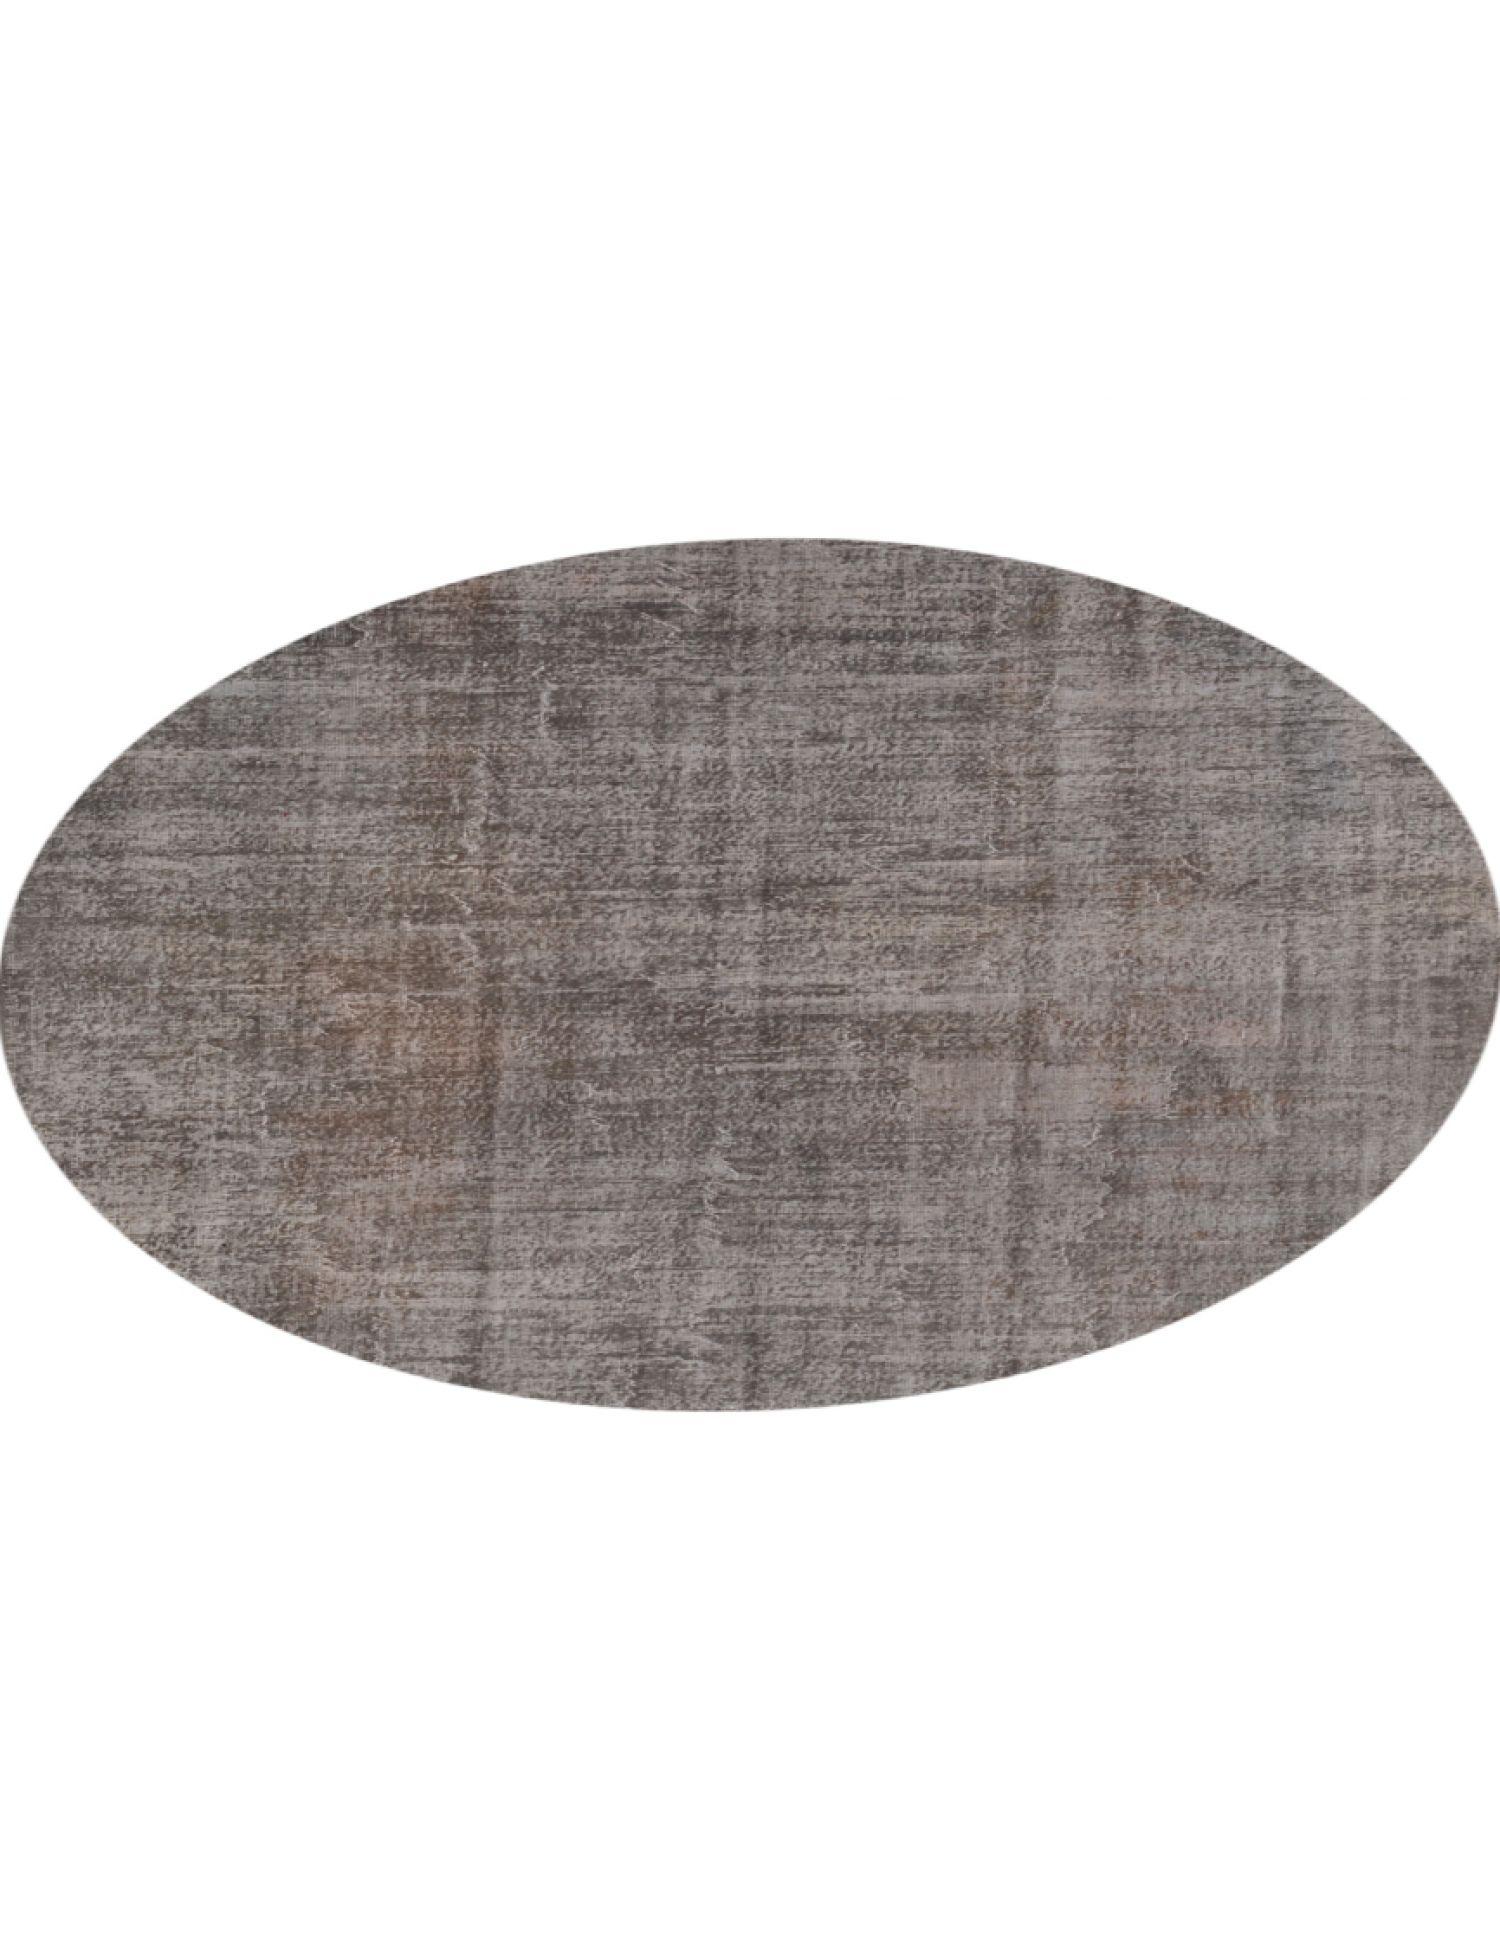 Tappeto Vintage  marrone <br/>248 x 248 cm